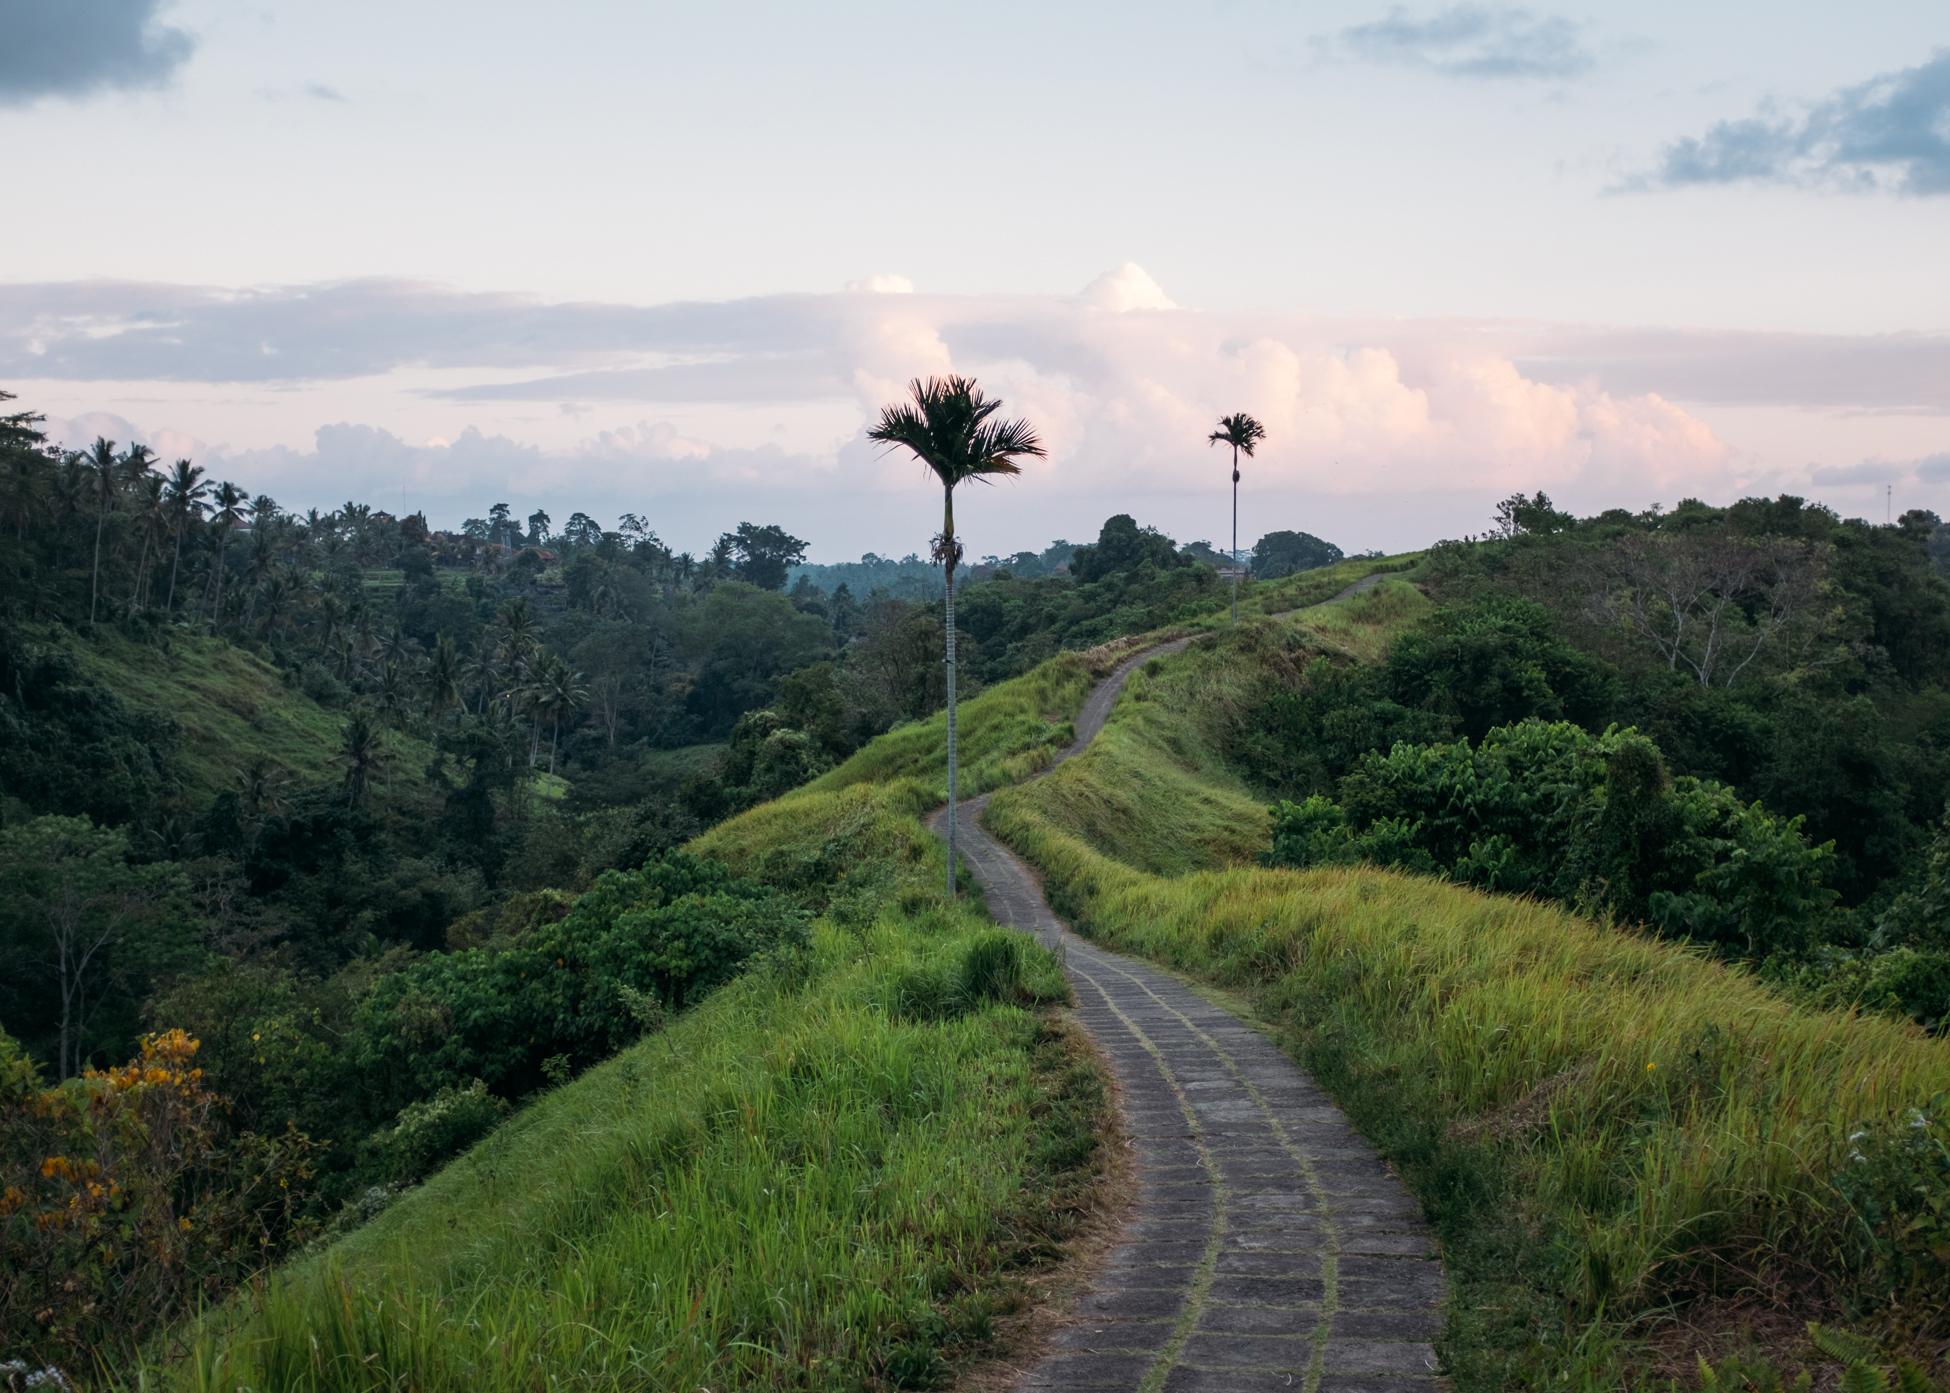 Winding Path, Indonesia, 2015